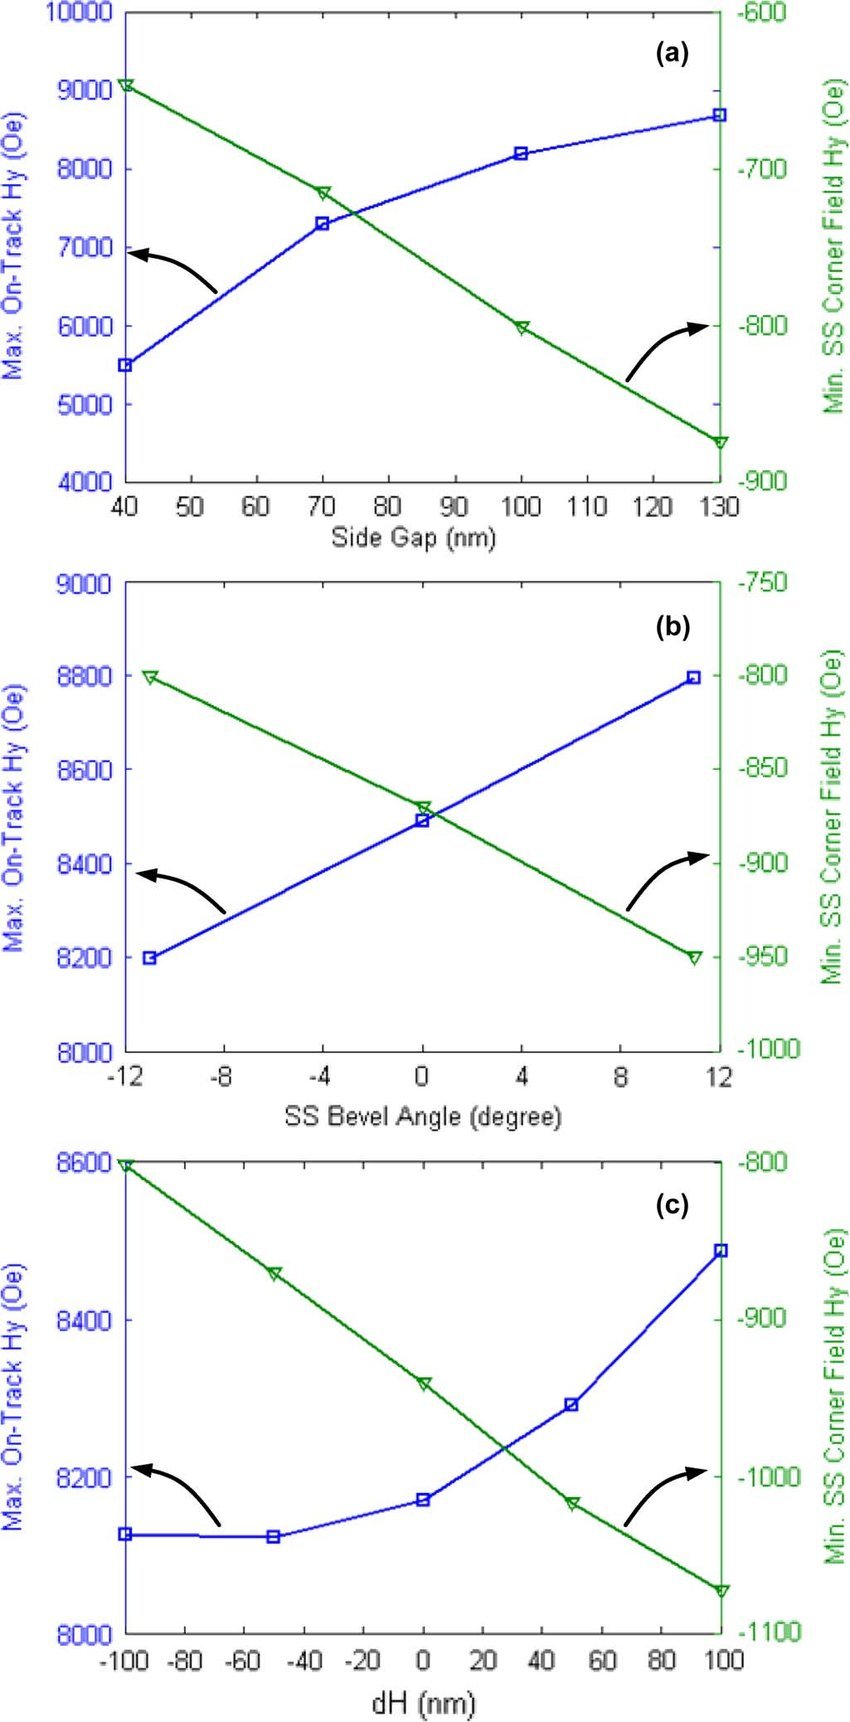 track and field diagram 1996 ford ranger wiring maximum on hy minimum ss corner versus download scientific